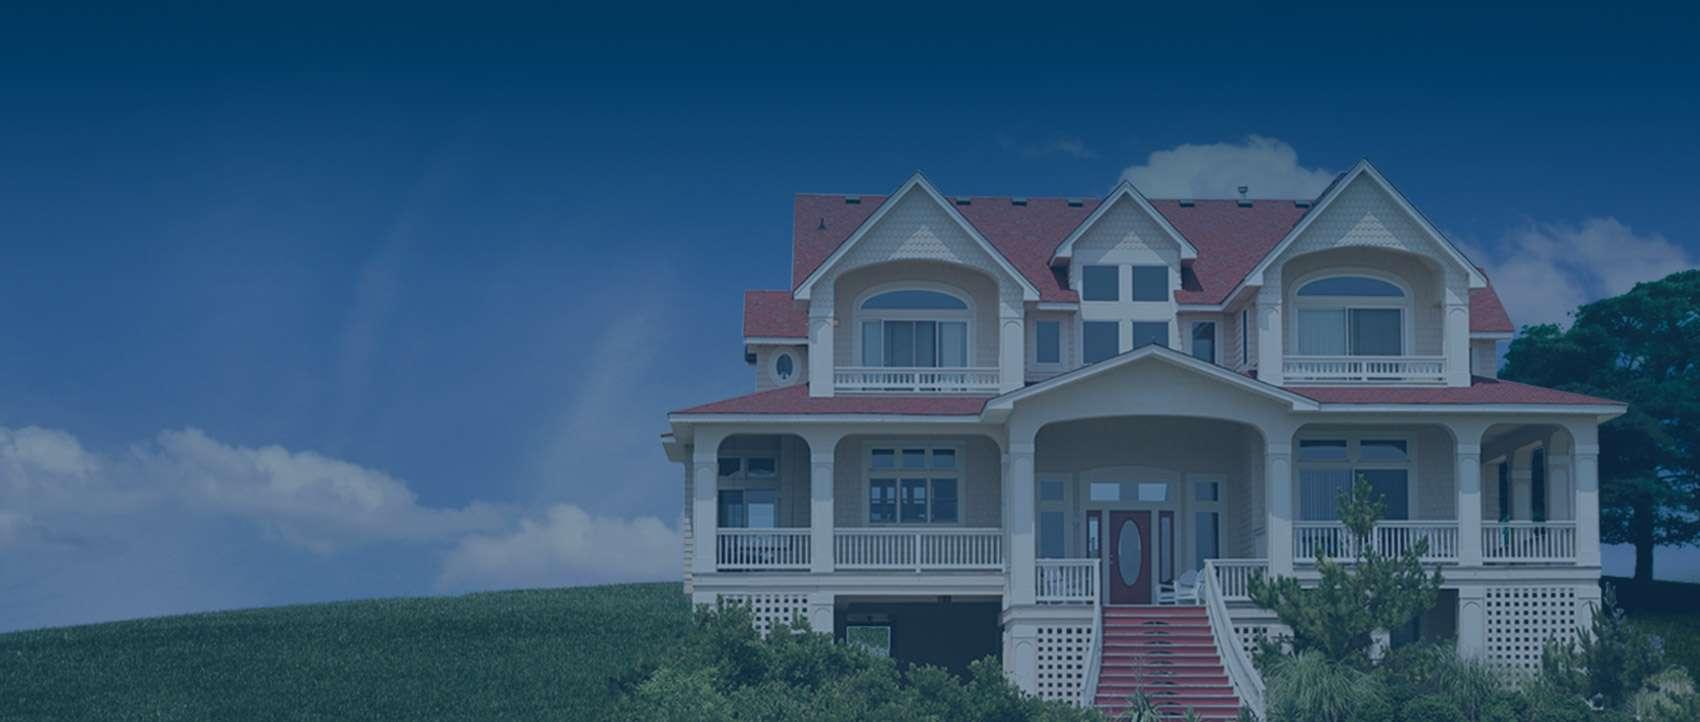 Home Inspection Checklist in Tulsa